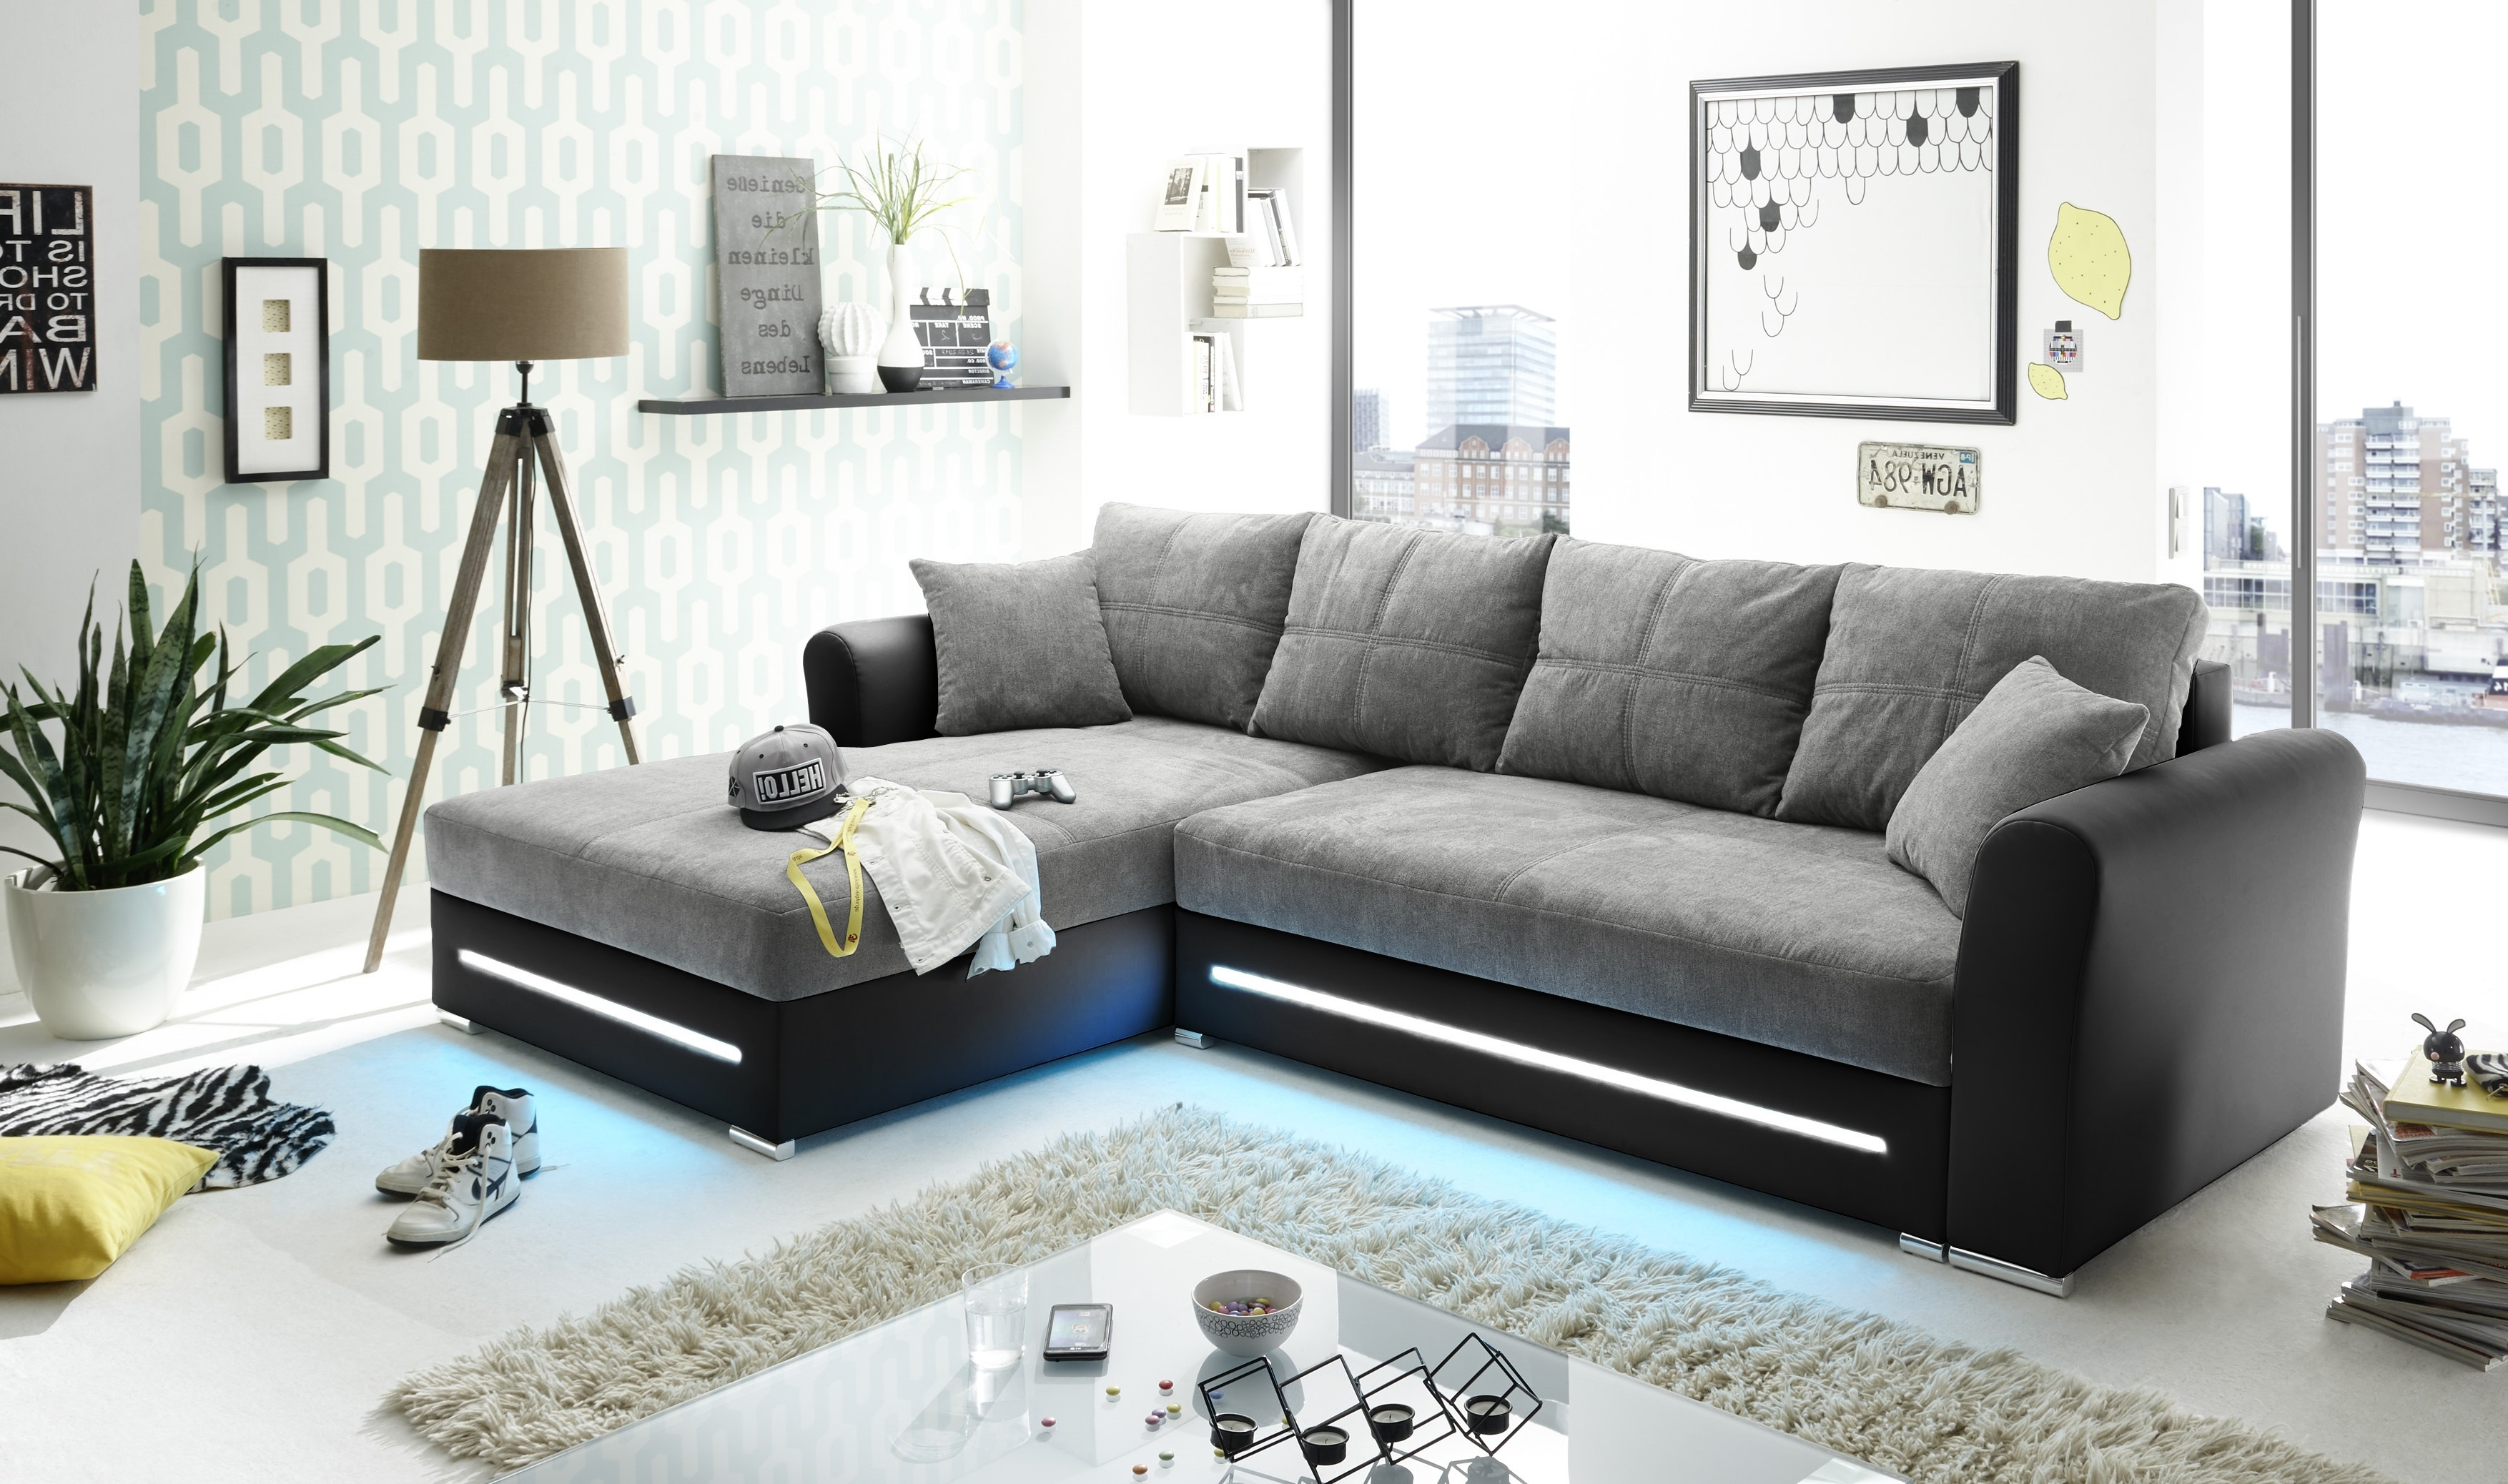 Schlafcouch Schlamm Grau Schwarz L Form Led Sofa Couch Led